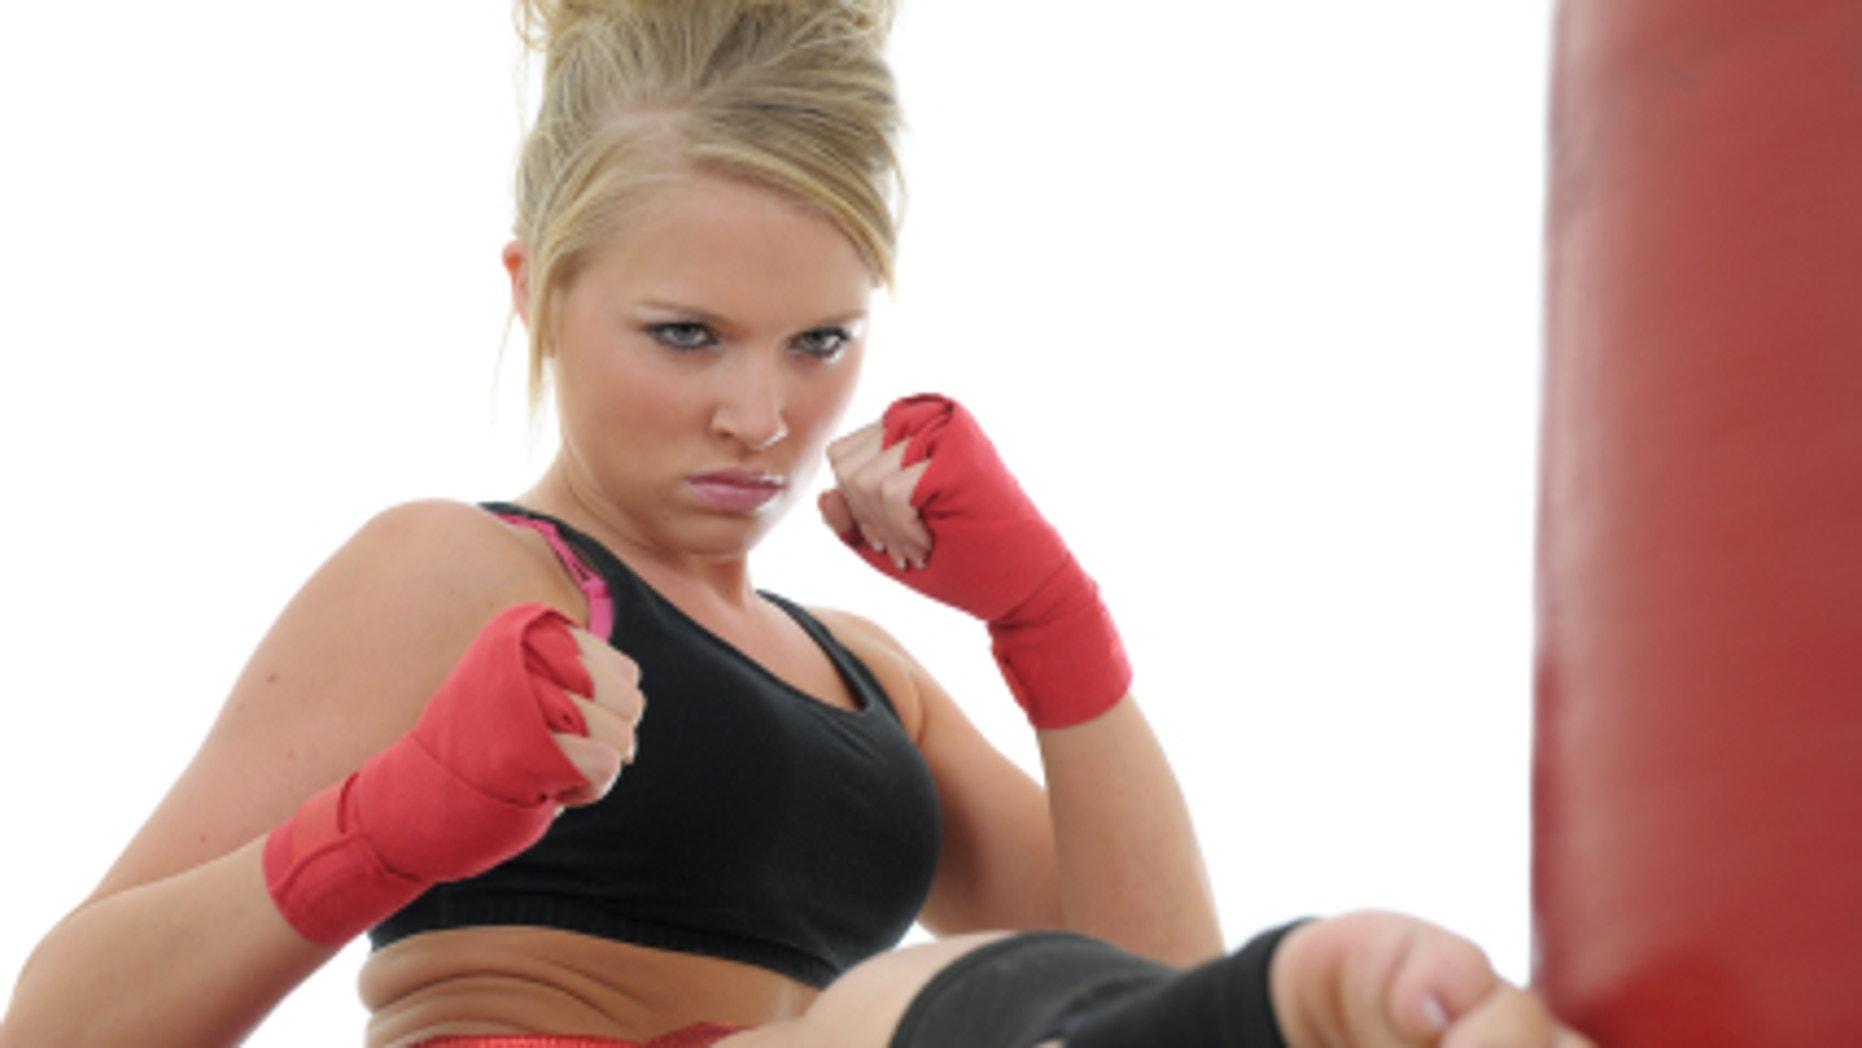 Kickboxer kicking a heavy bag.